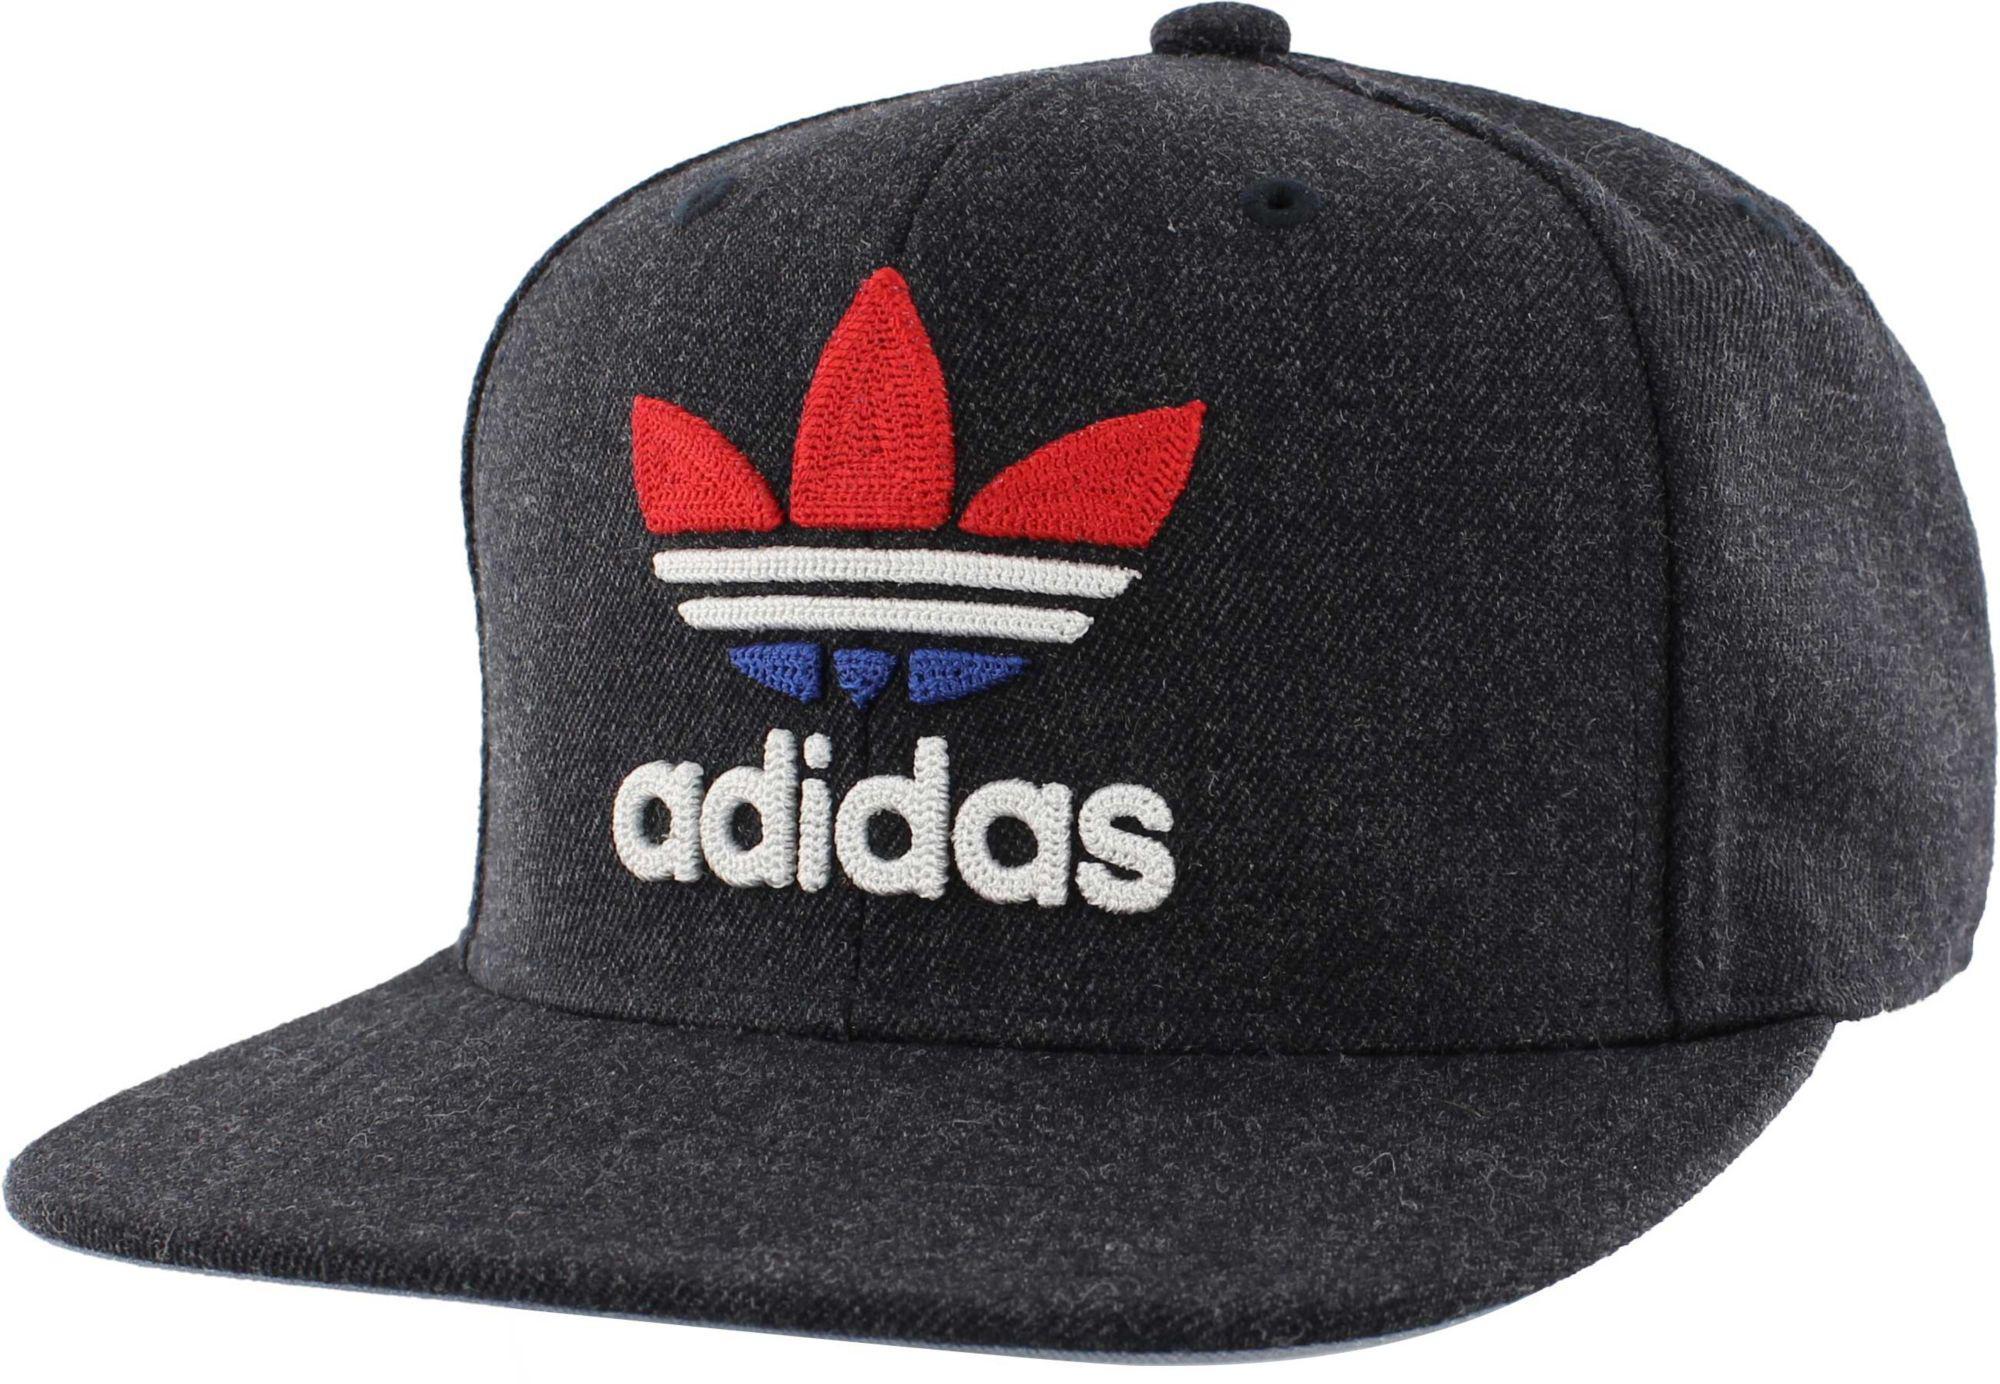 Lyst - adidas Originals Trefoil Chain Snapback Hat in Blue for Men e823c284de57